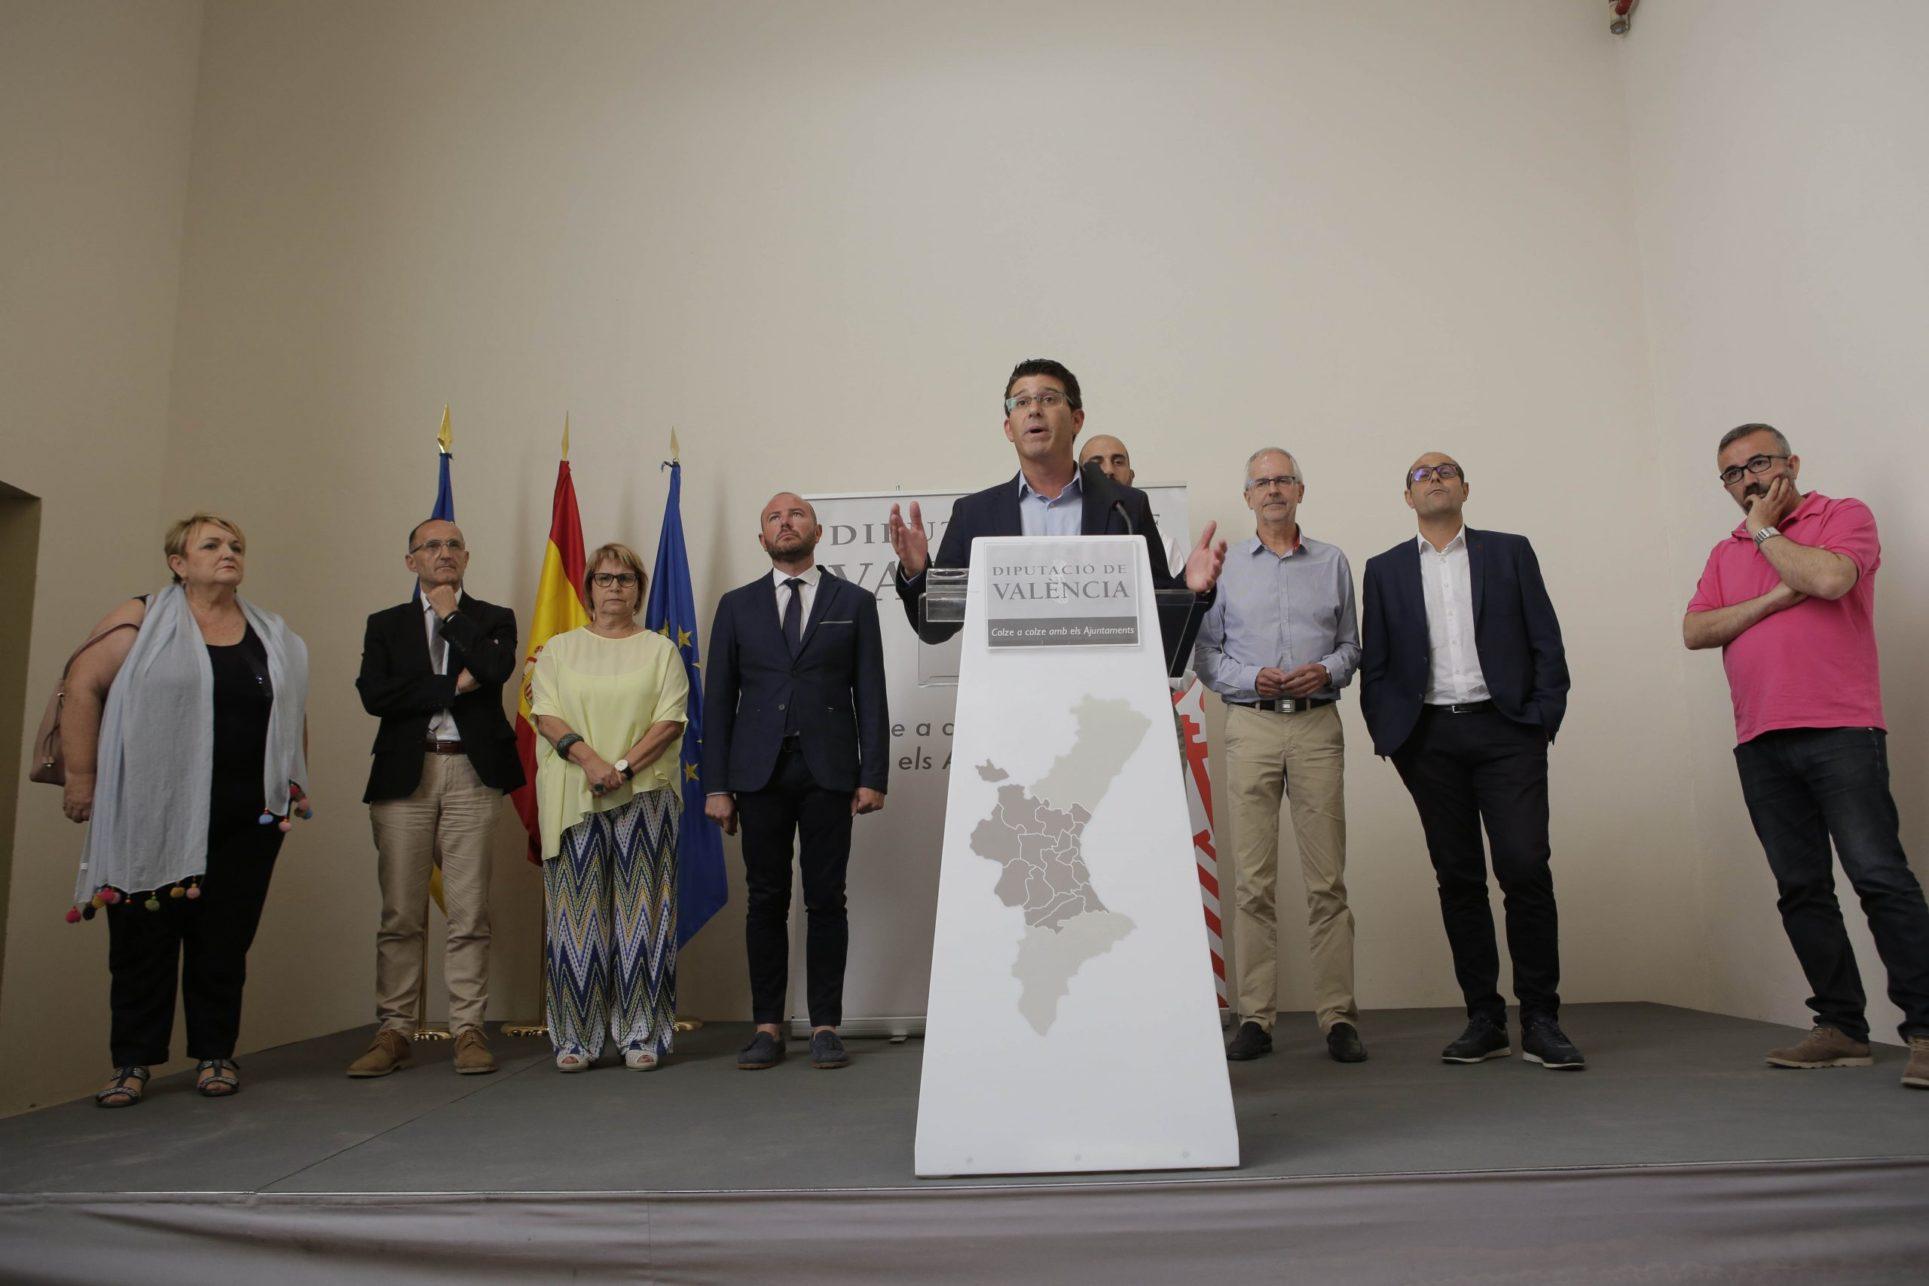 Jorge Rodríguez dimite como presidente El Periòdic d'Ontinyent - Noticies a Ontinyent